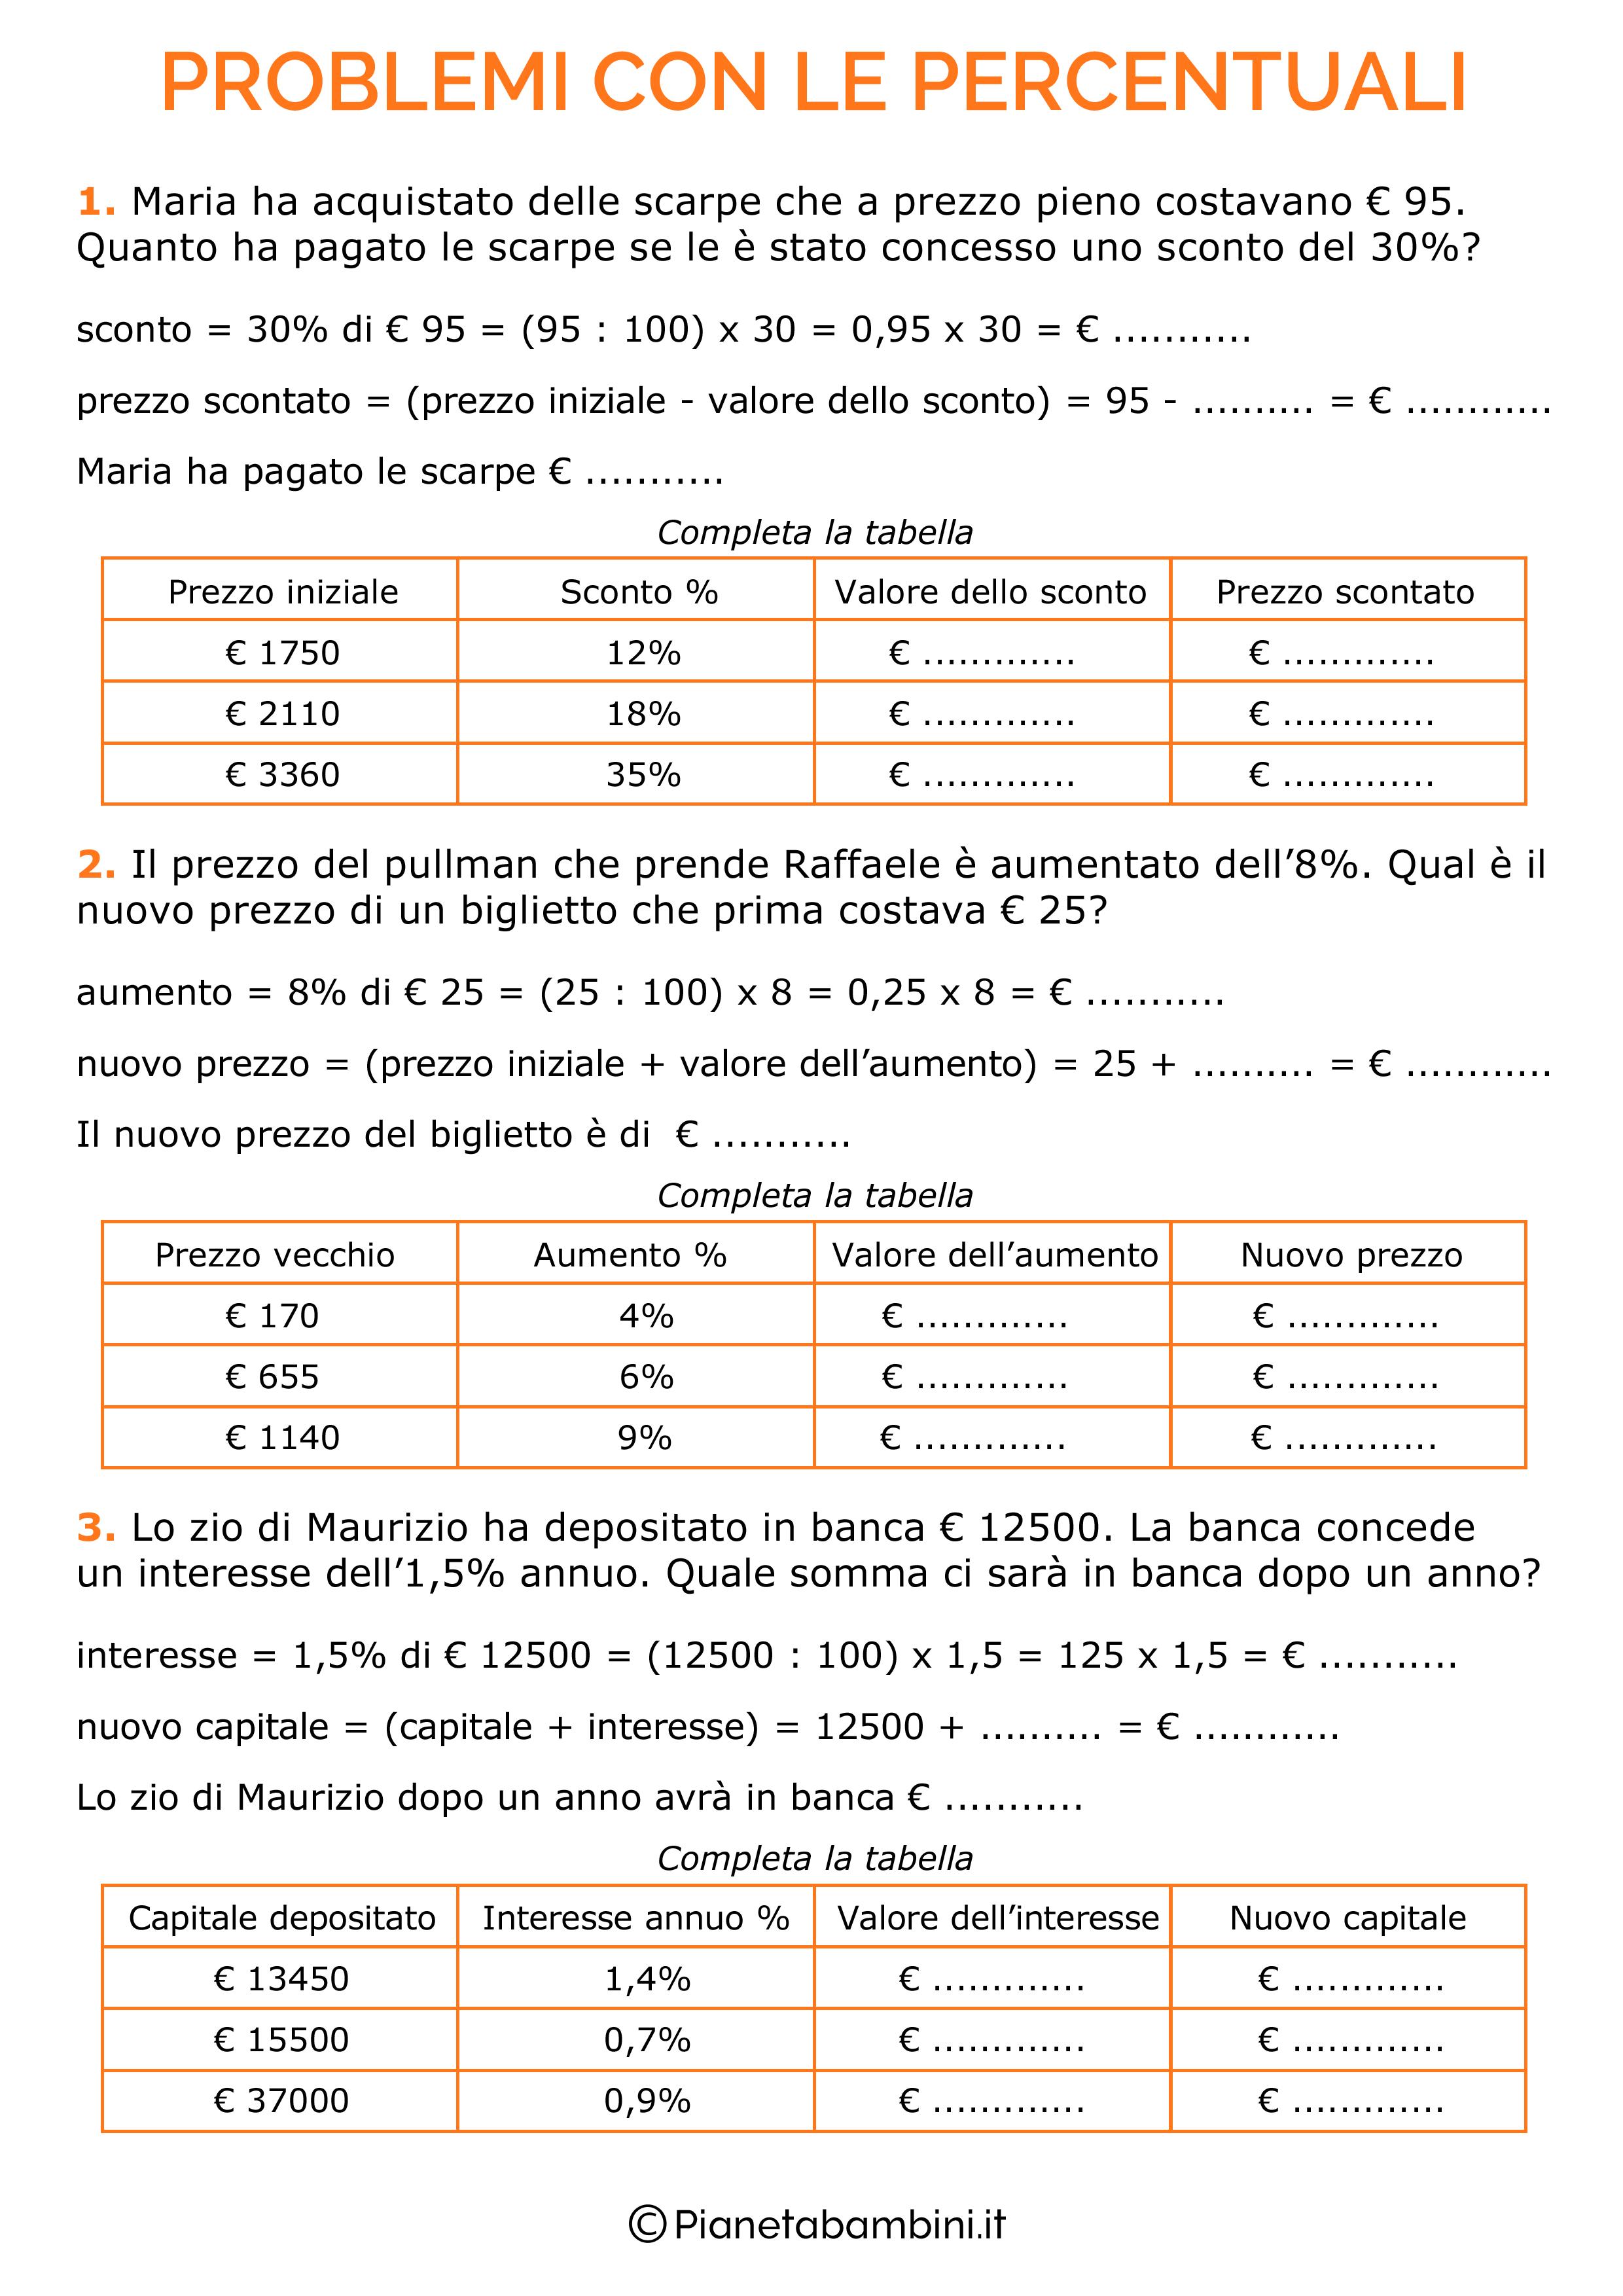 Problemi-Percentuali-1